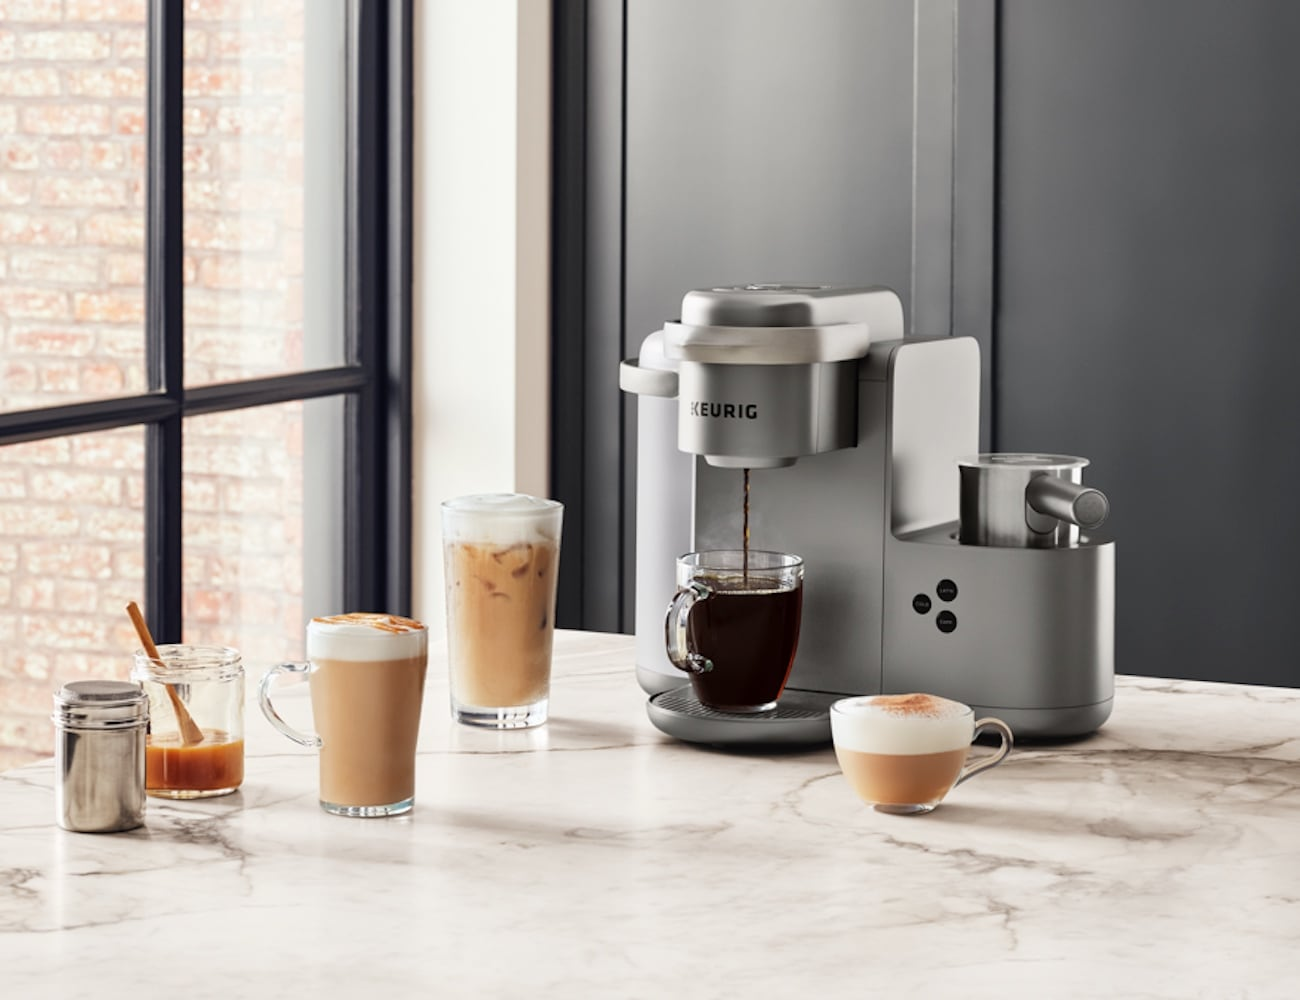 Keurig K Café Single Serve Coffee Maker Gadget Flow